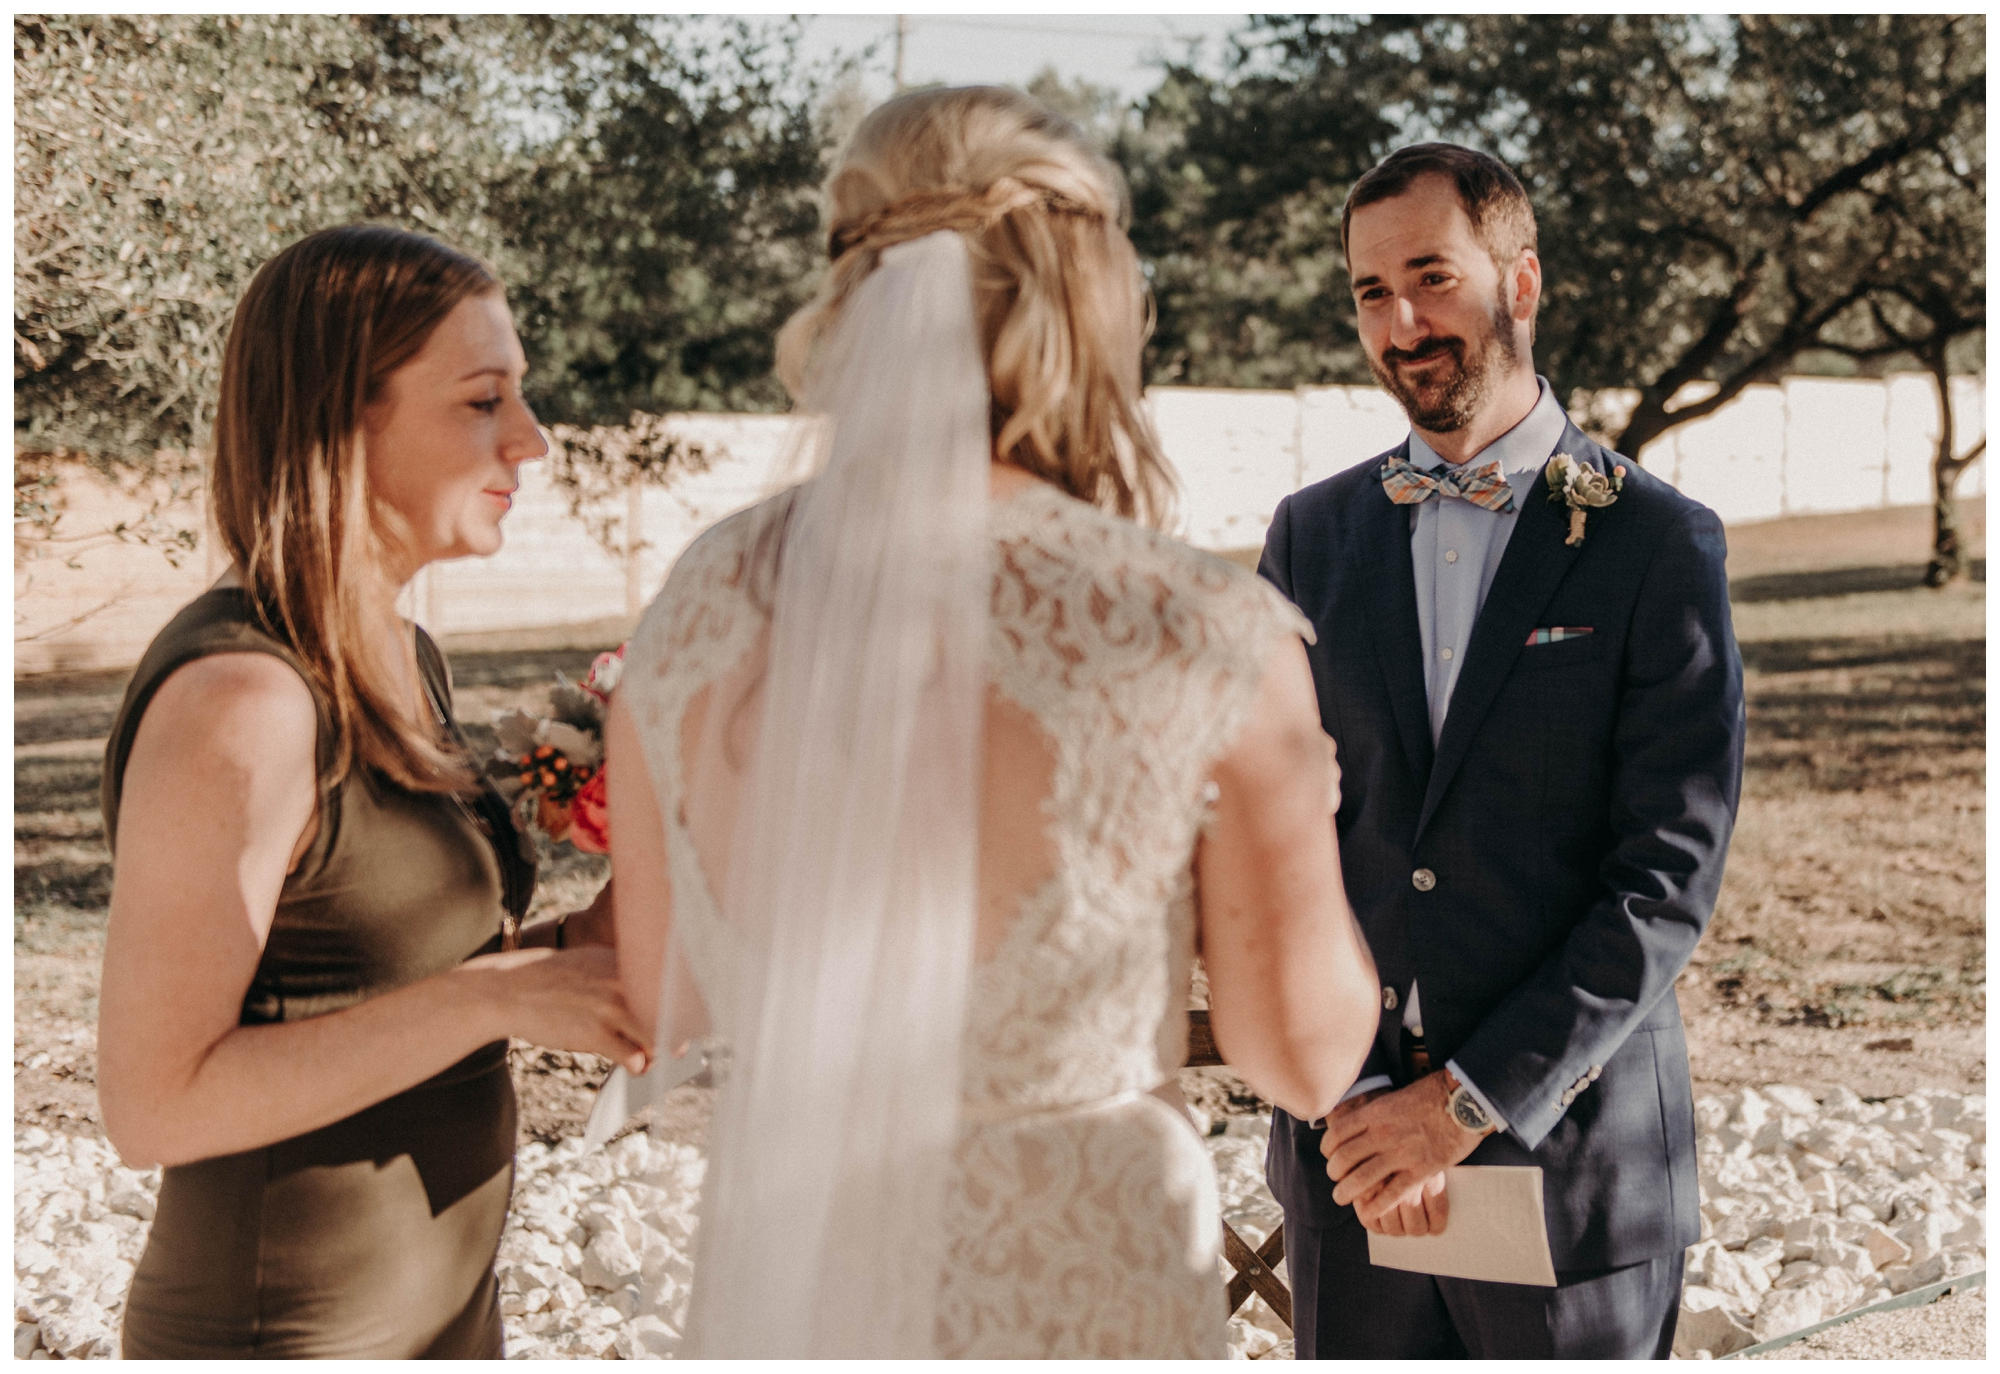 austin-texas-wedding-photography-1778-photographie_0051.jpg